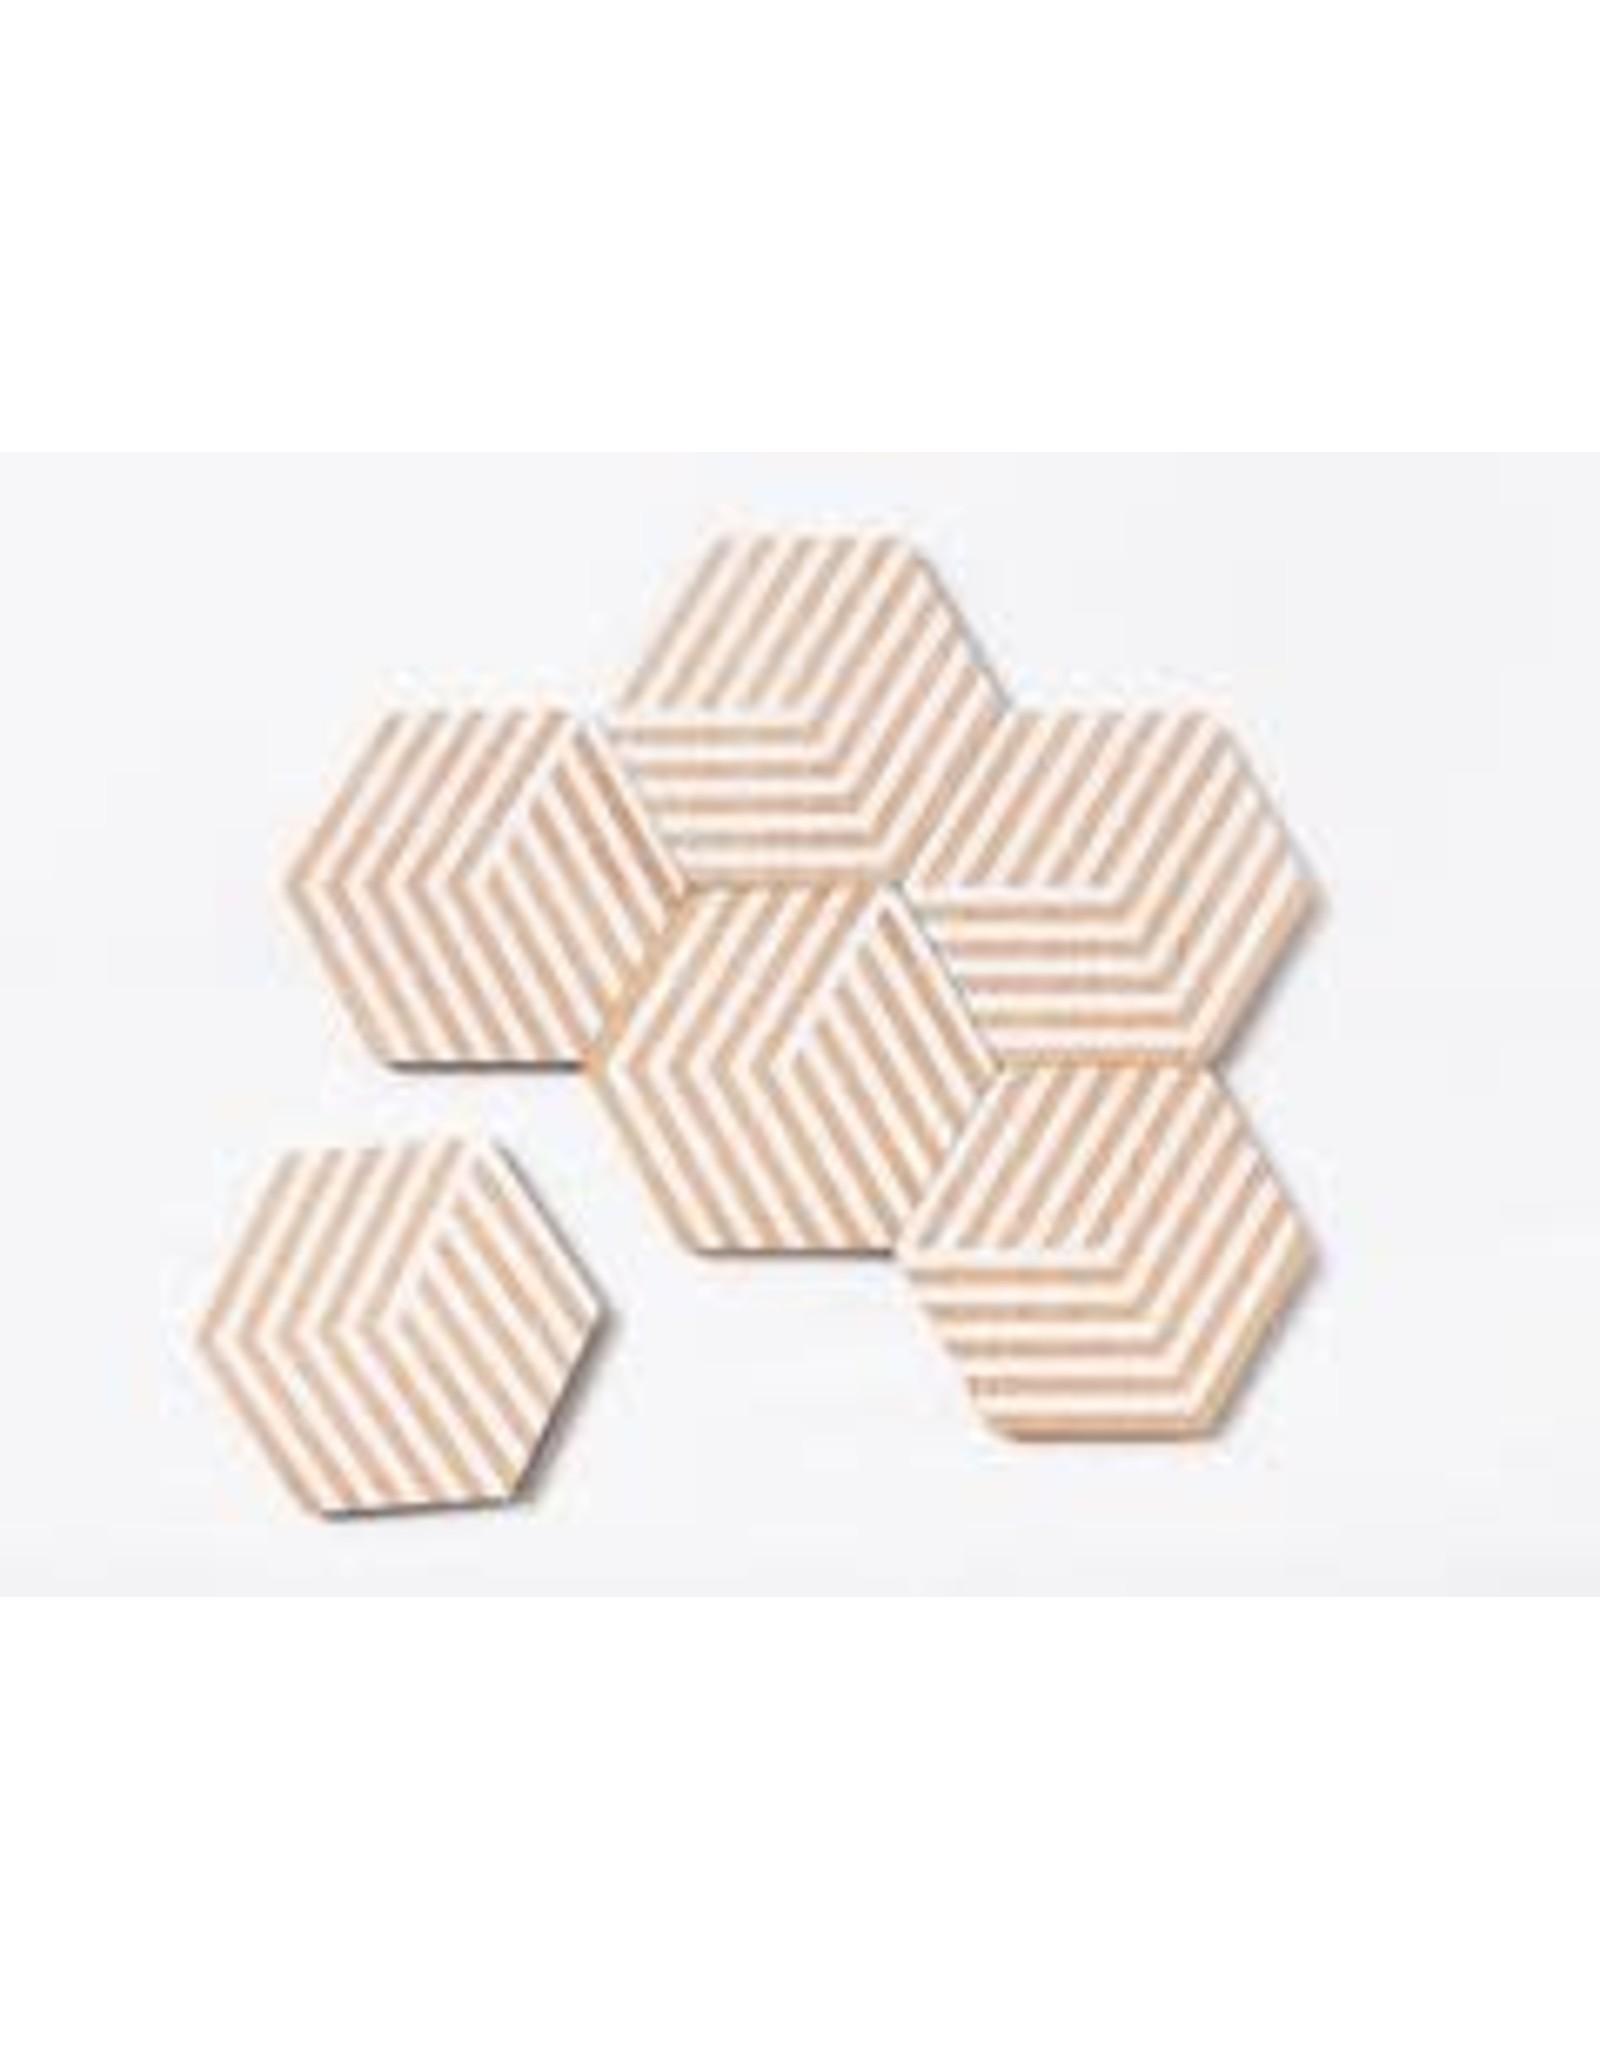 Areaware Table Tiles Optics Coasters